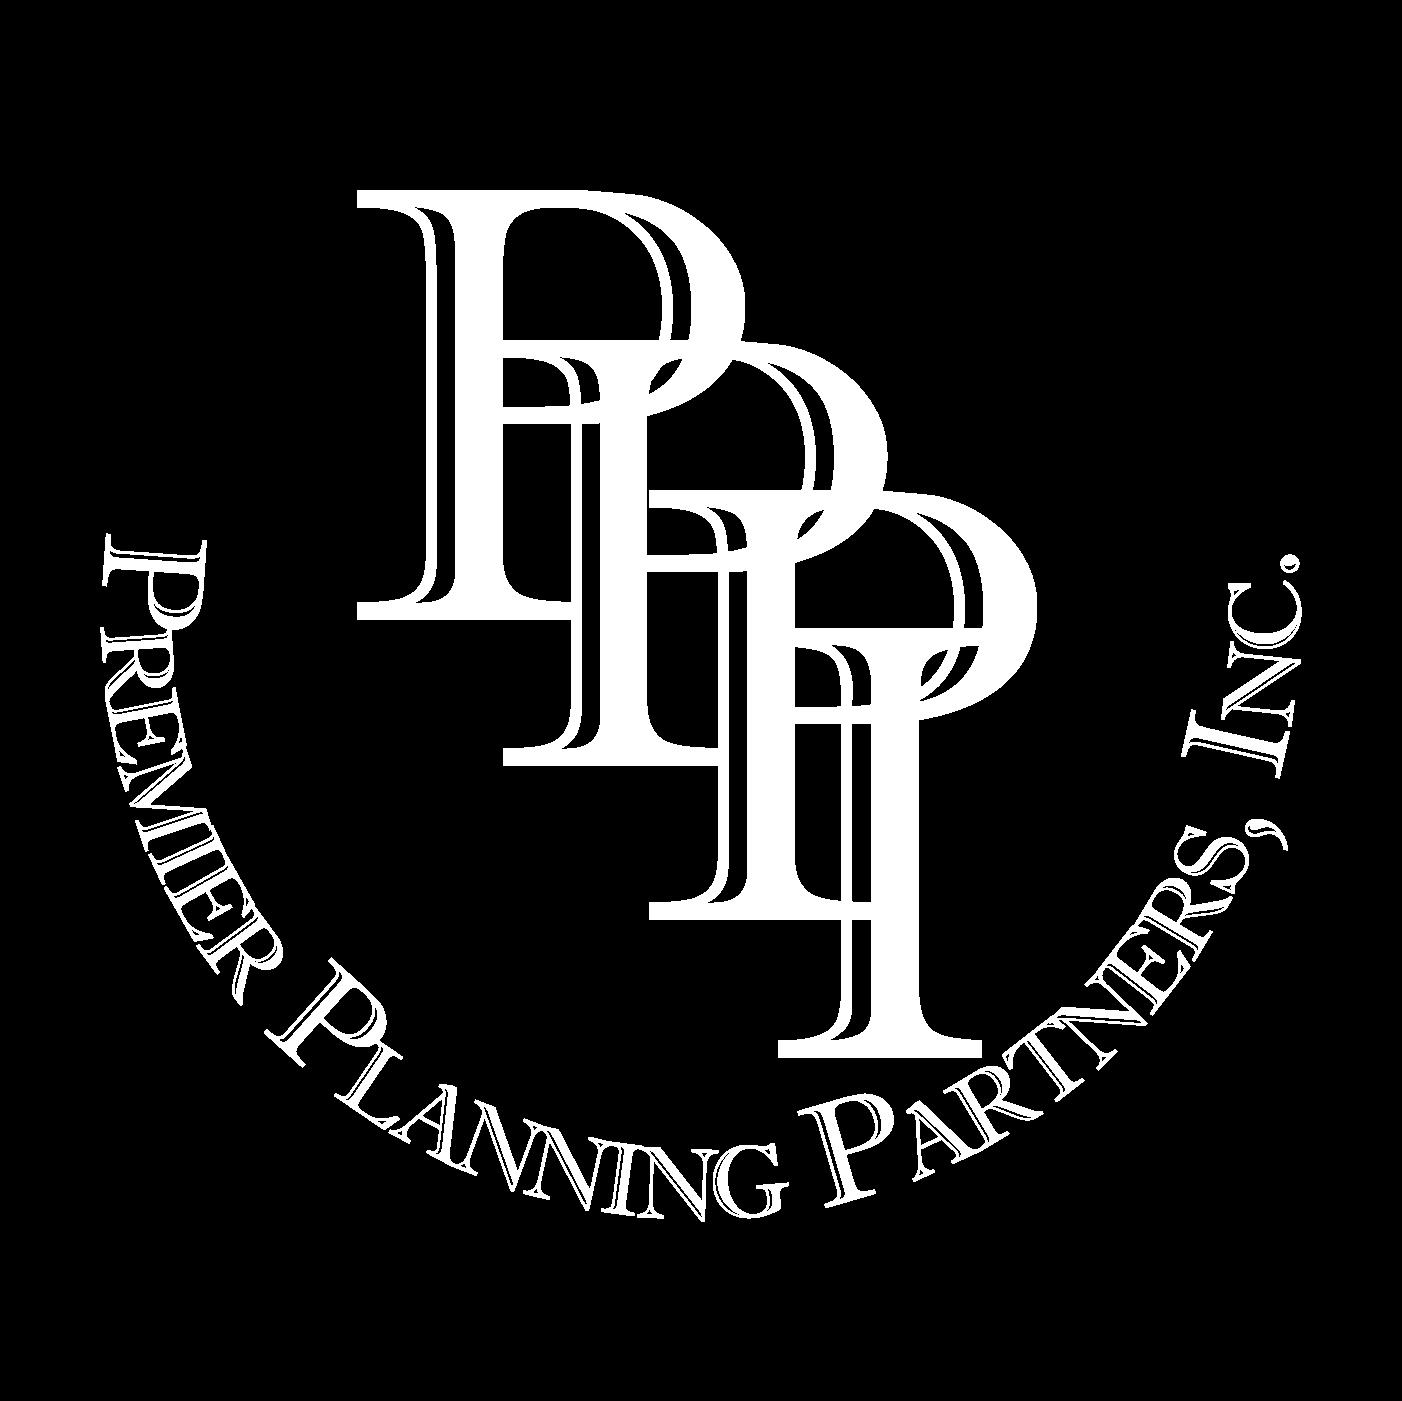 premierPlanningPartnersInc.logo.png